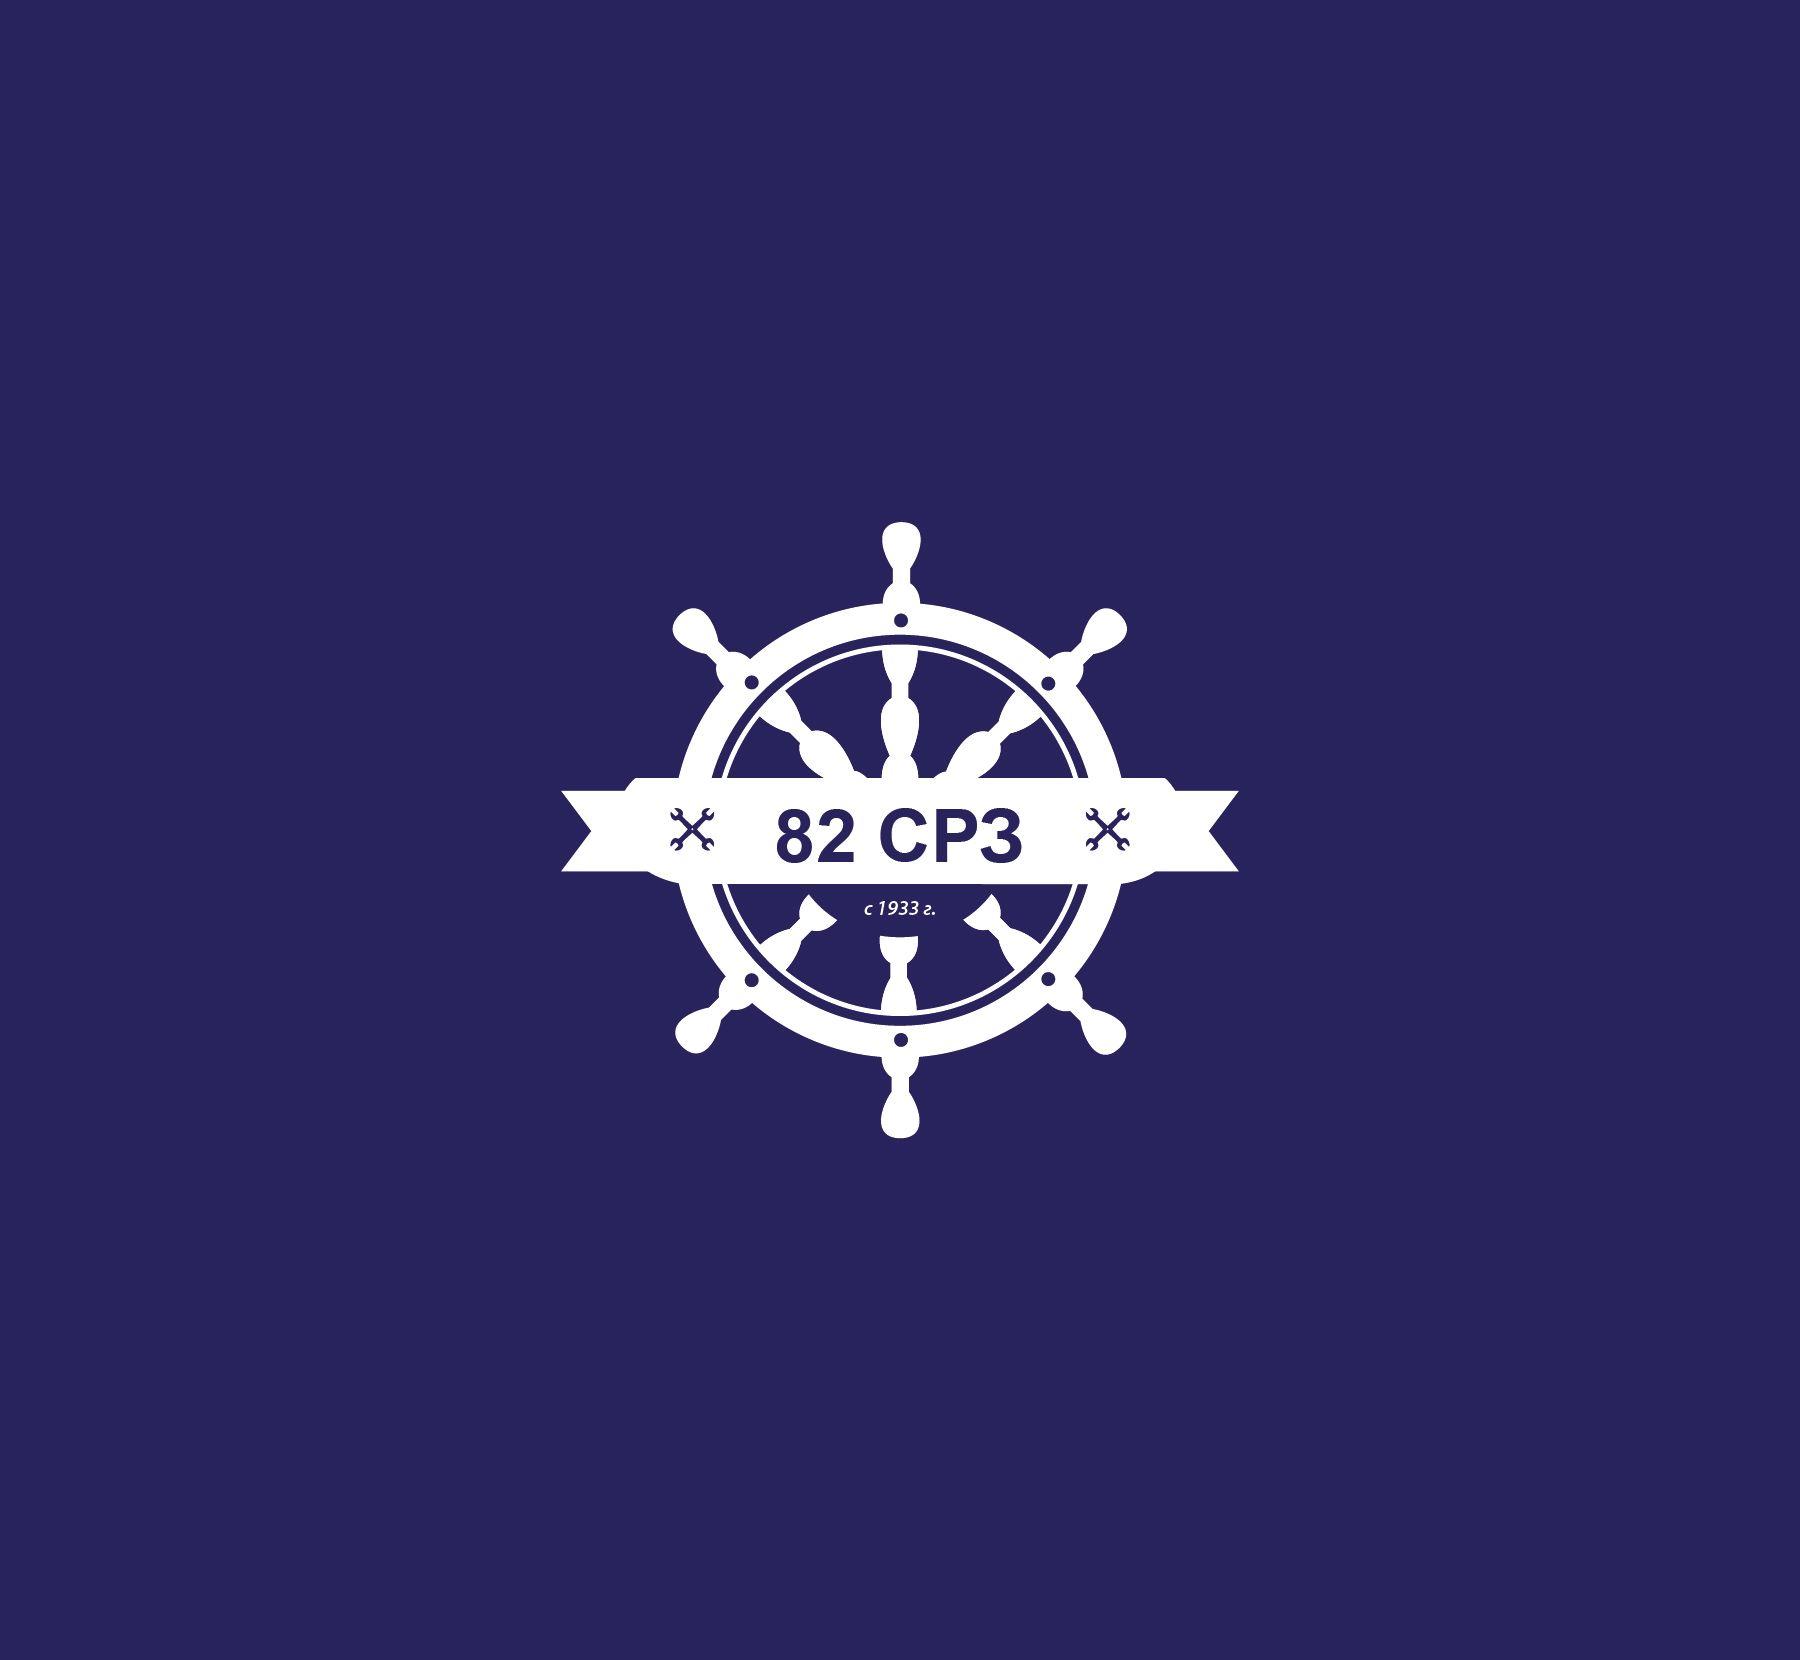 Логотип для судоремонтного завода - дизайнер LilyLilyLily